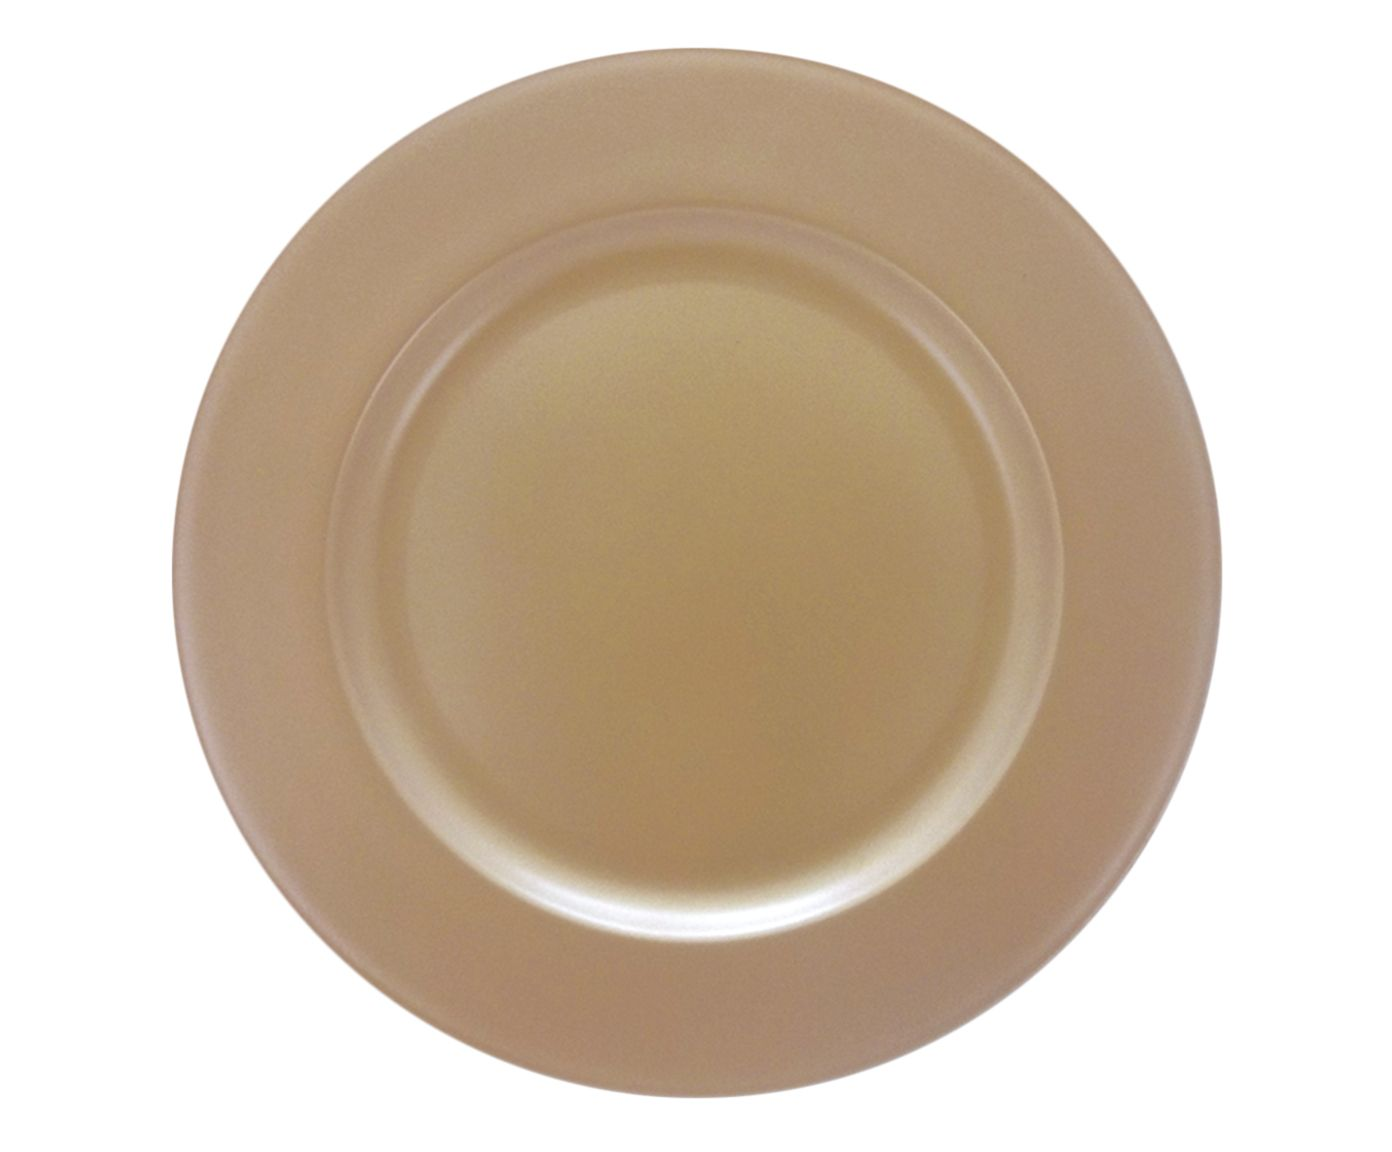 Sousplat Chá Dourado - 30cm | Westwing.com.br